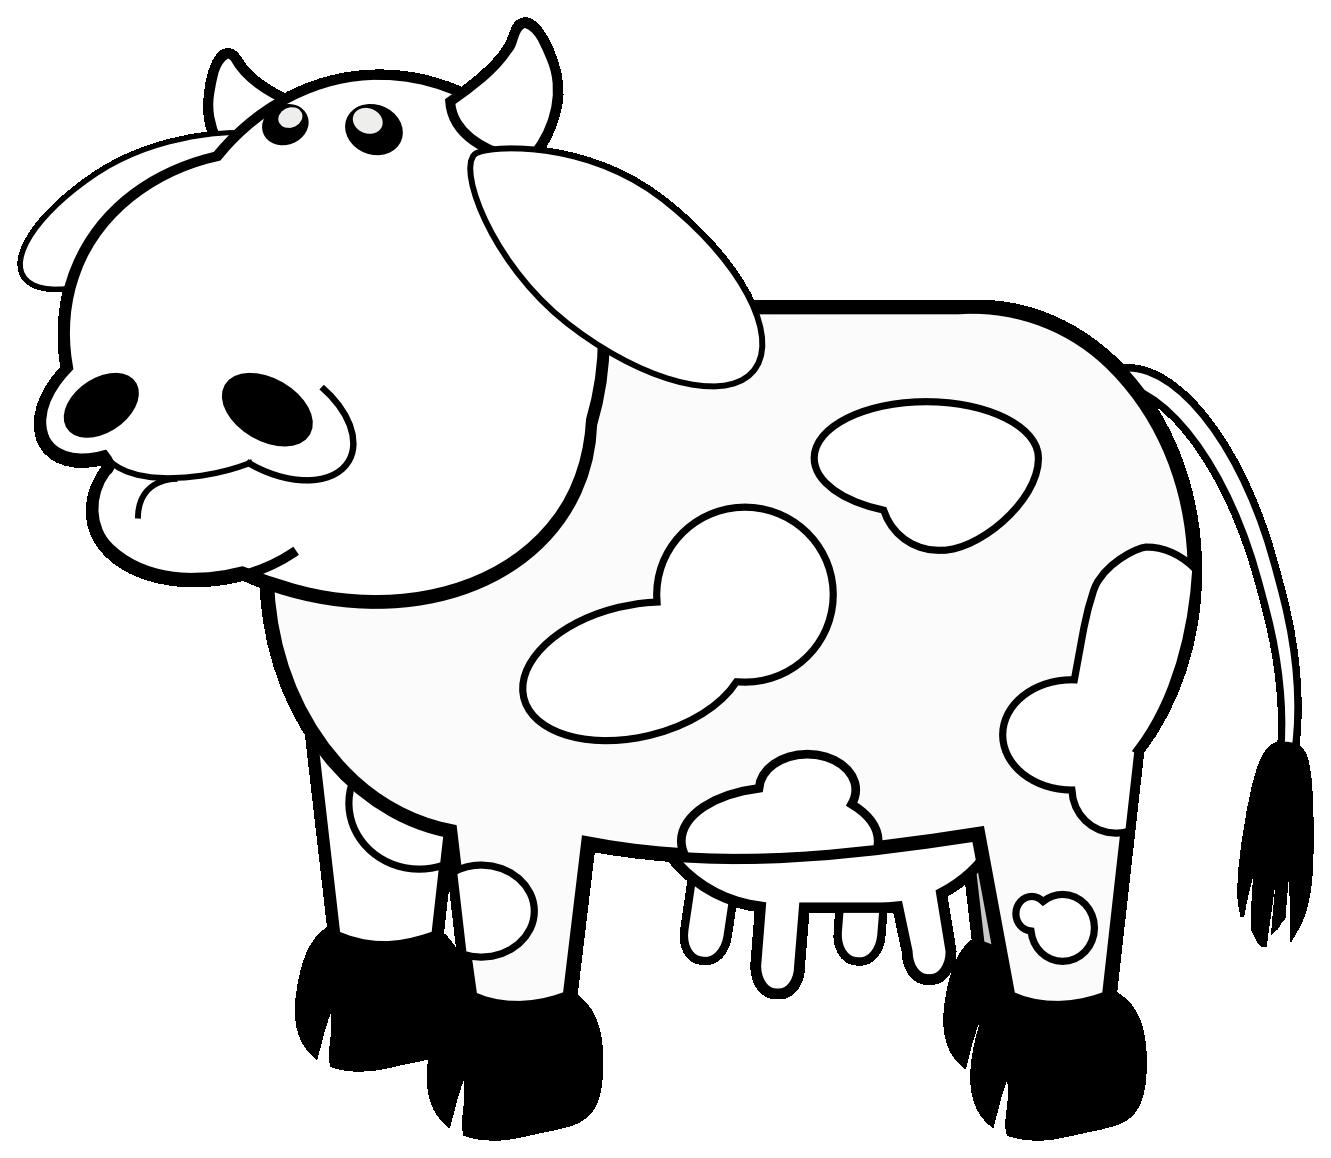 Colour Cows 1 Black White